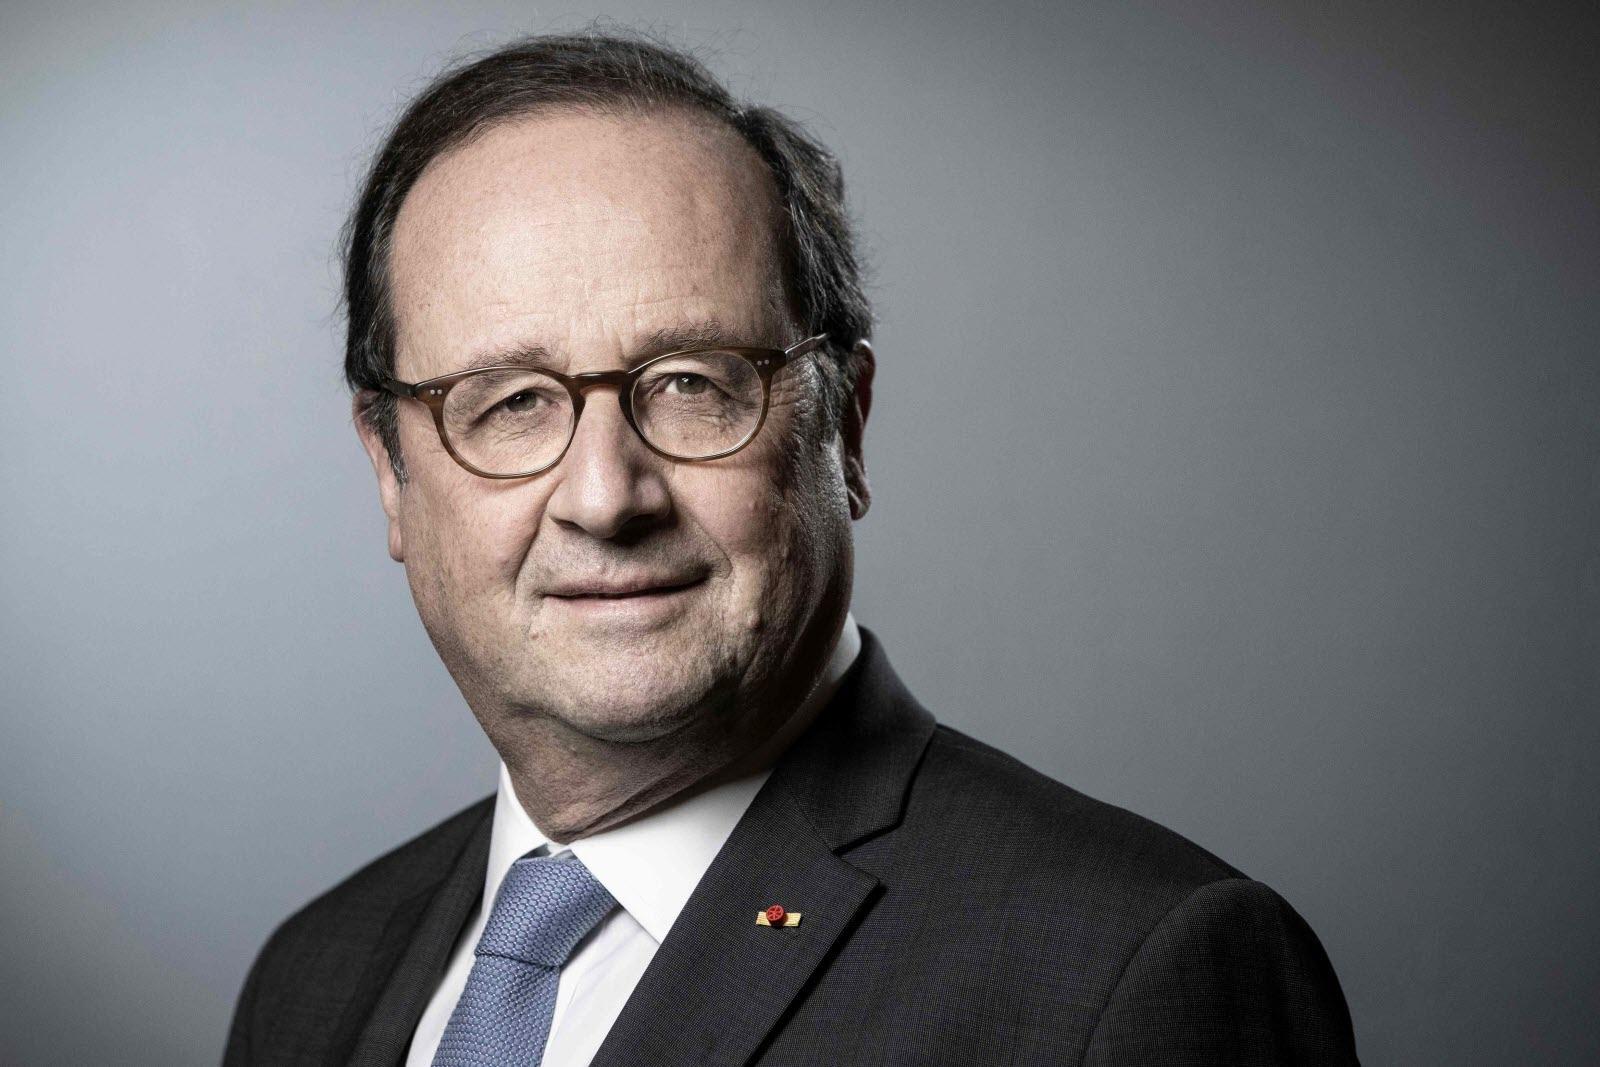 François Hollande choqué